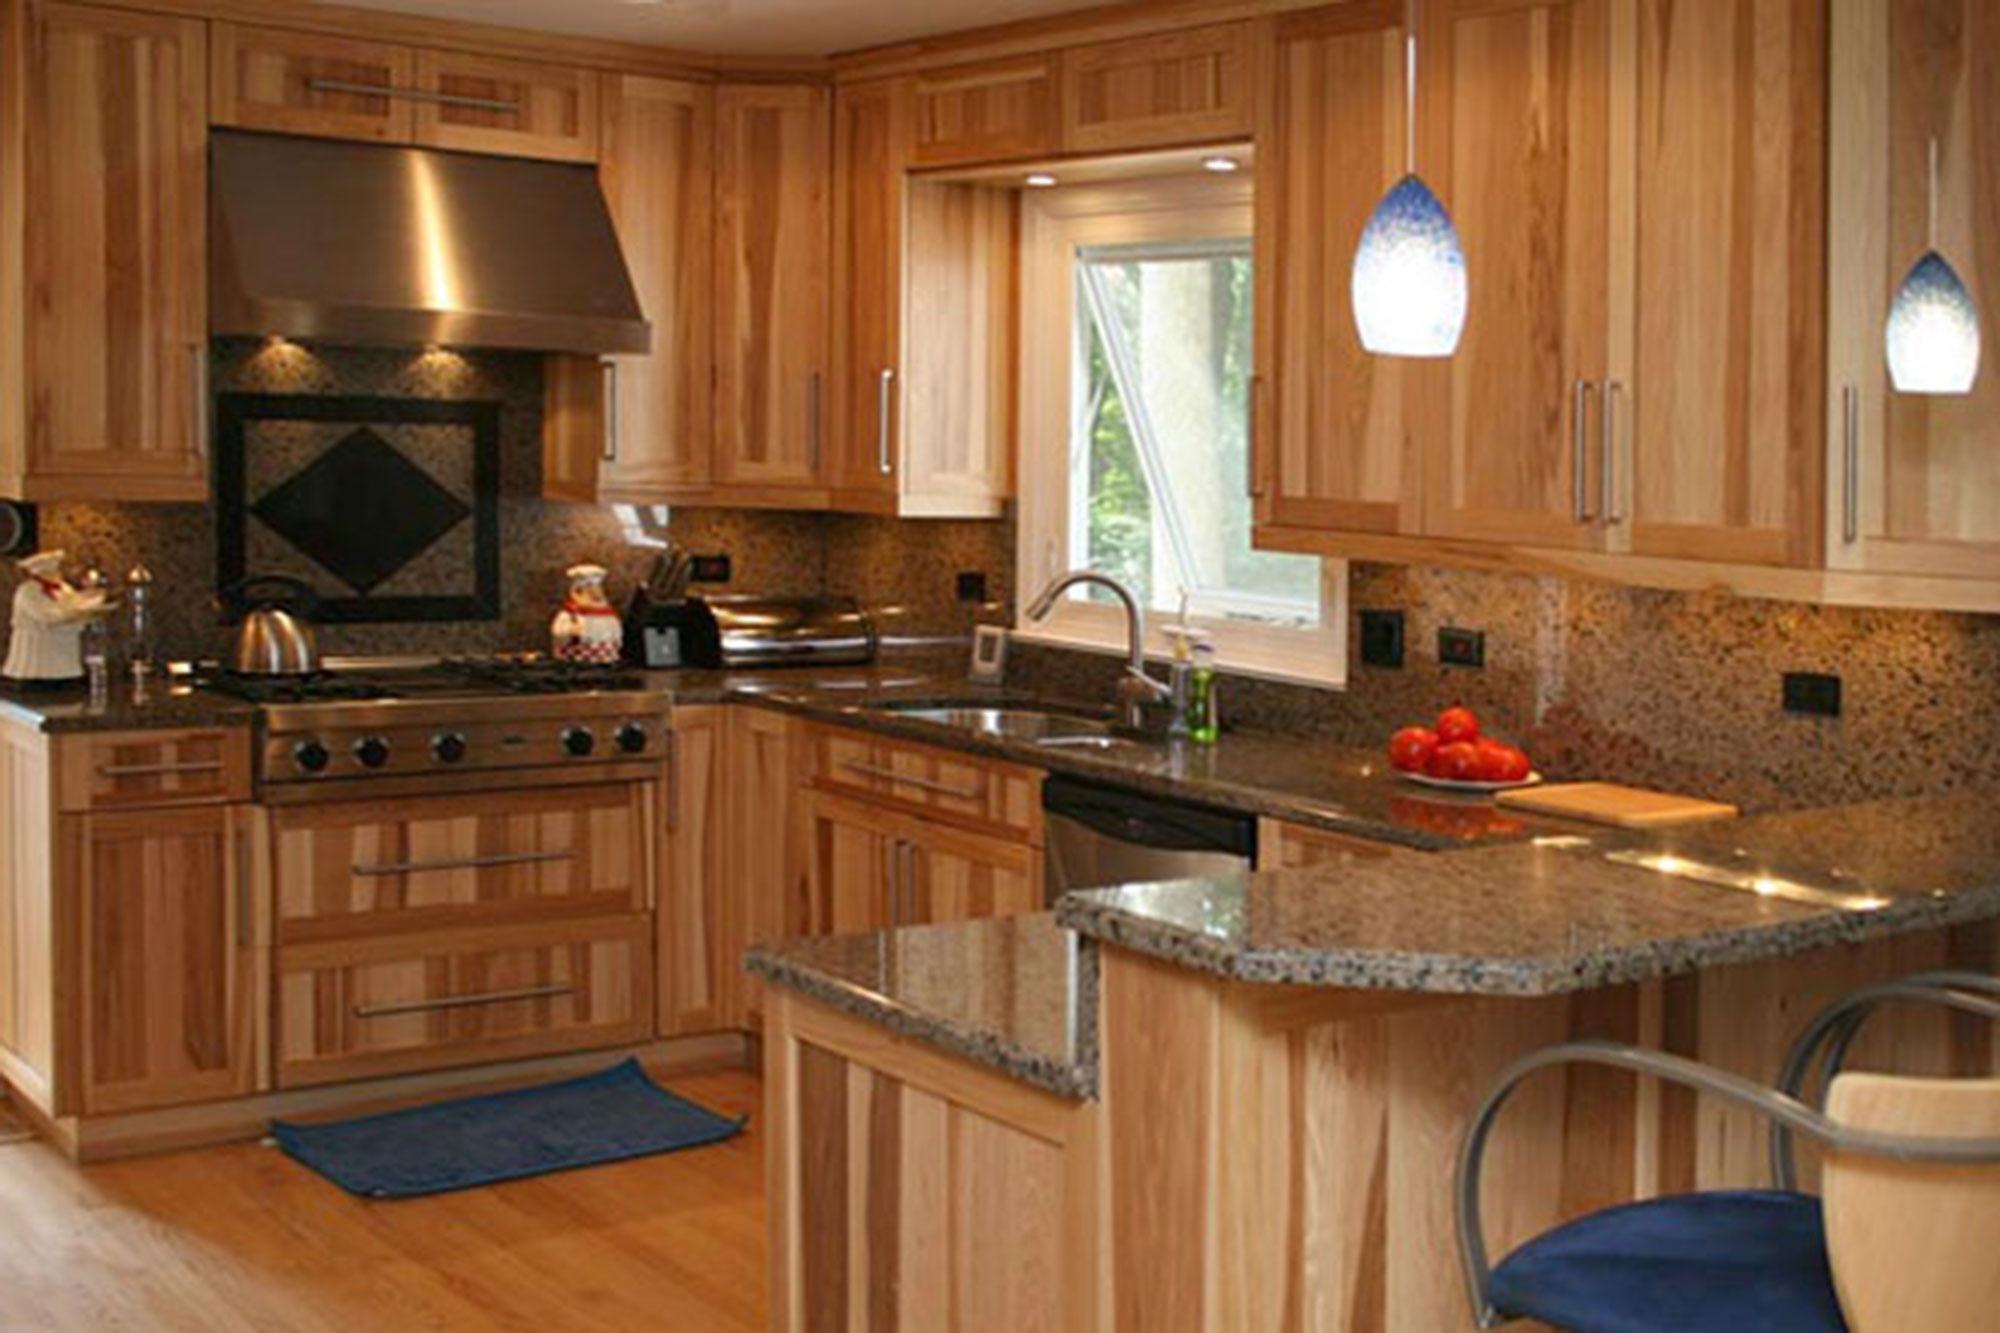 kitchen cabinets wood ranges custom bath melamine hickory semi